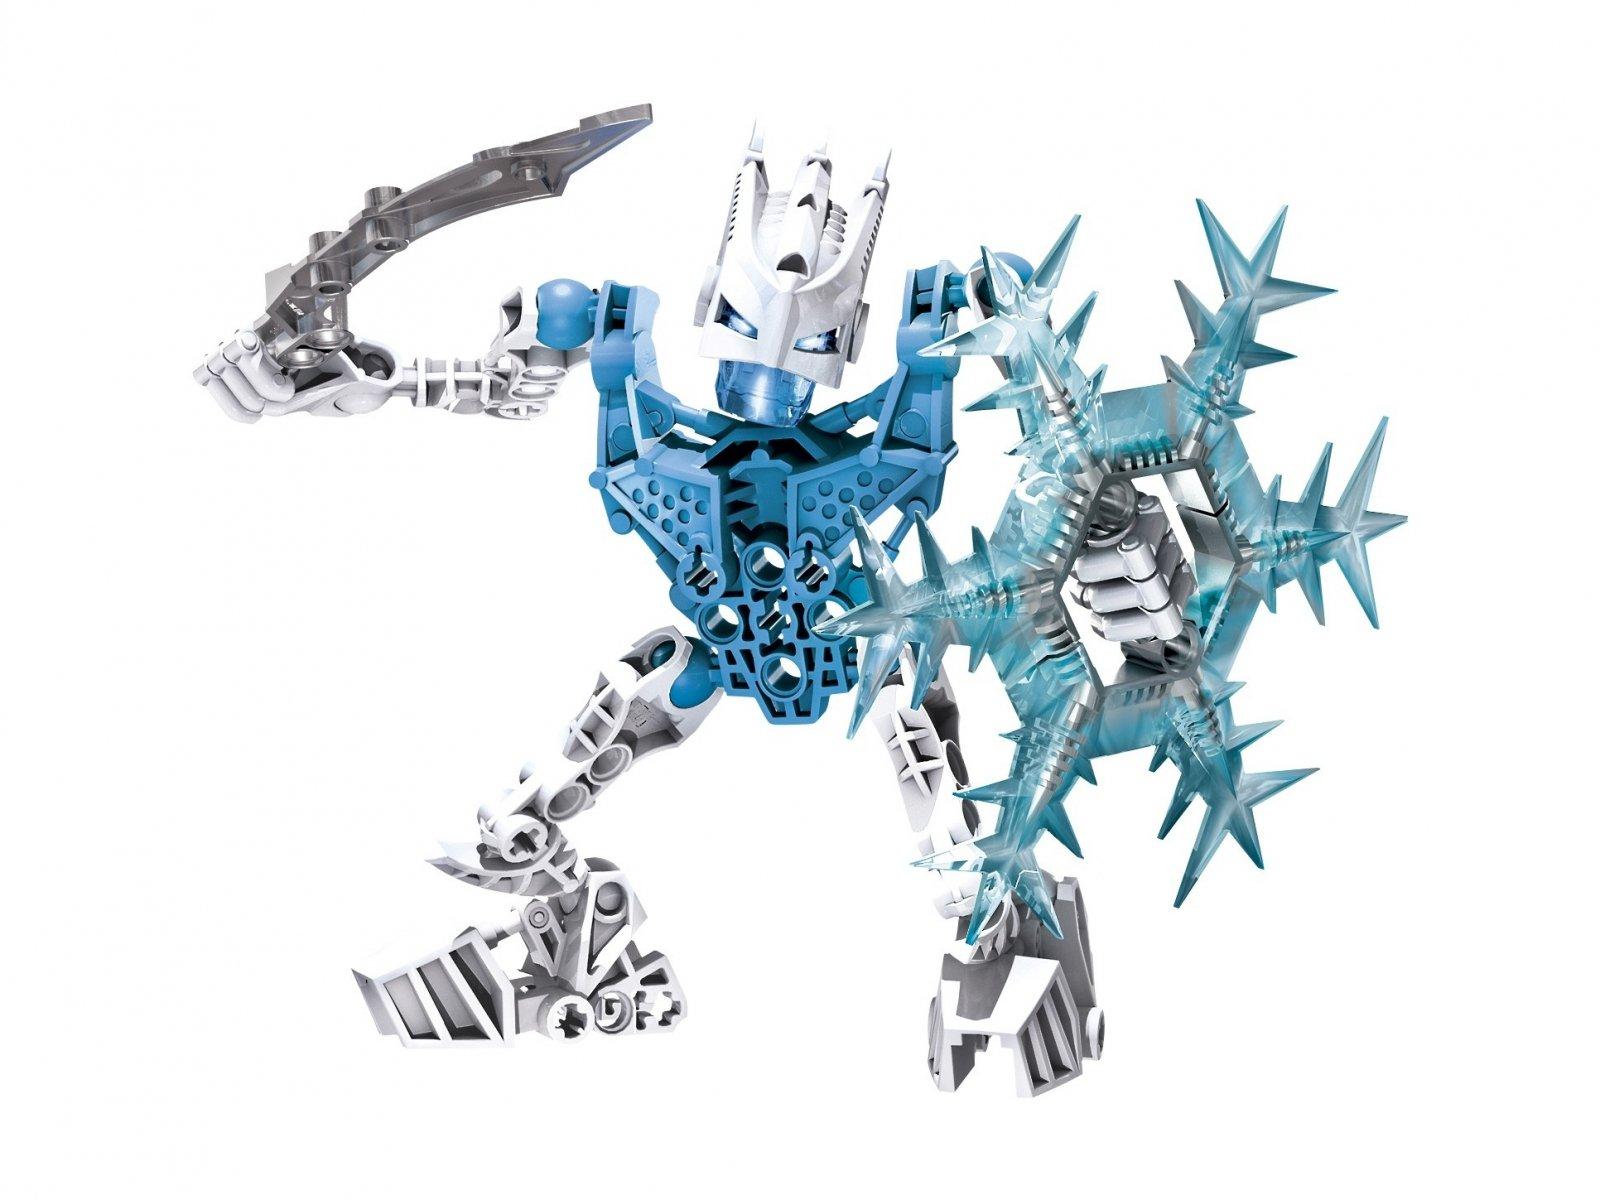 LEGO Bionicle® 8976 Metus